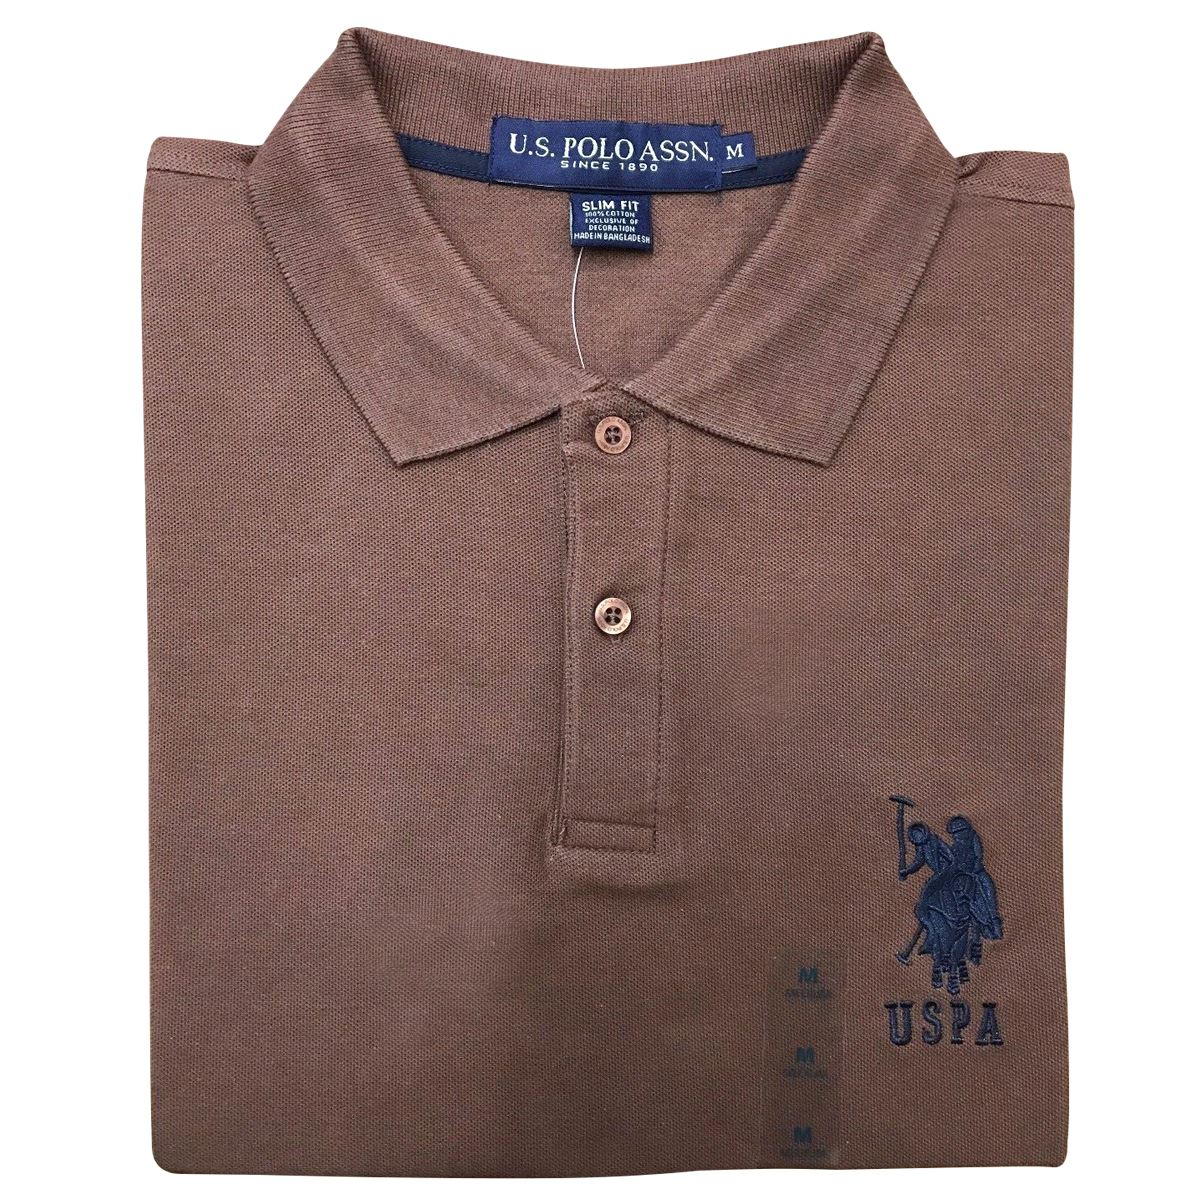 Mens polo tshirt original top designer summer t shirt for Polo t shirt design online